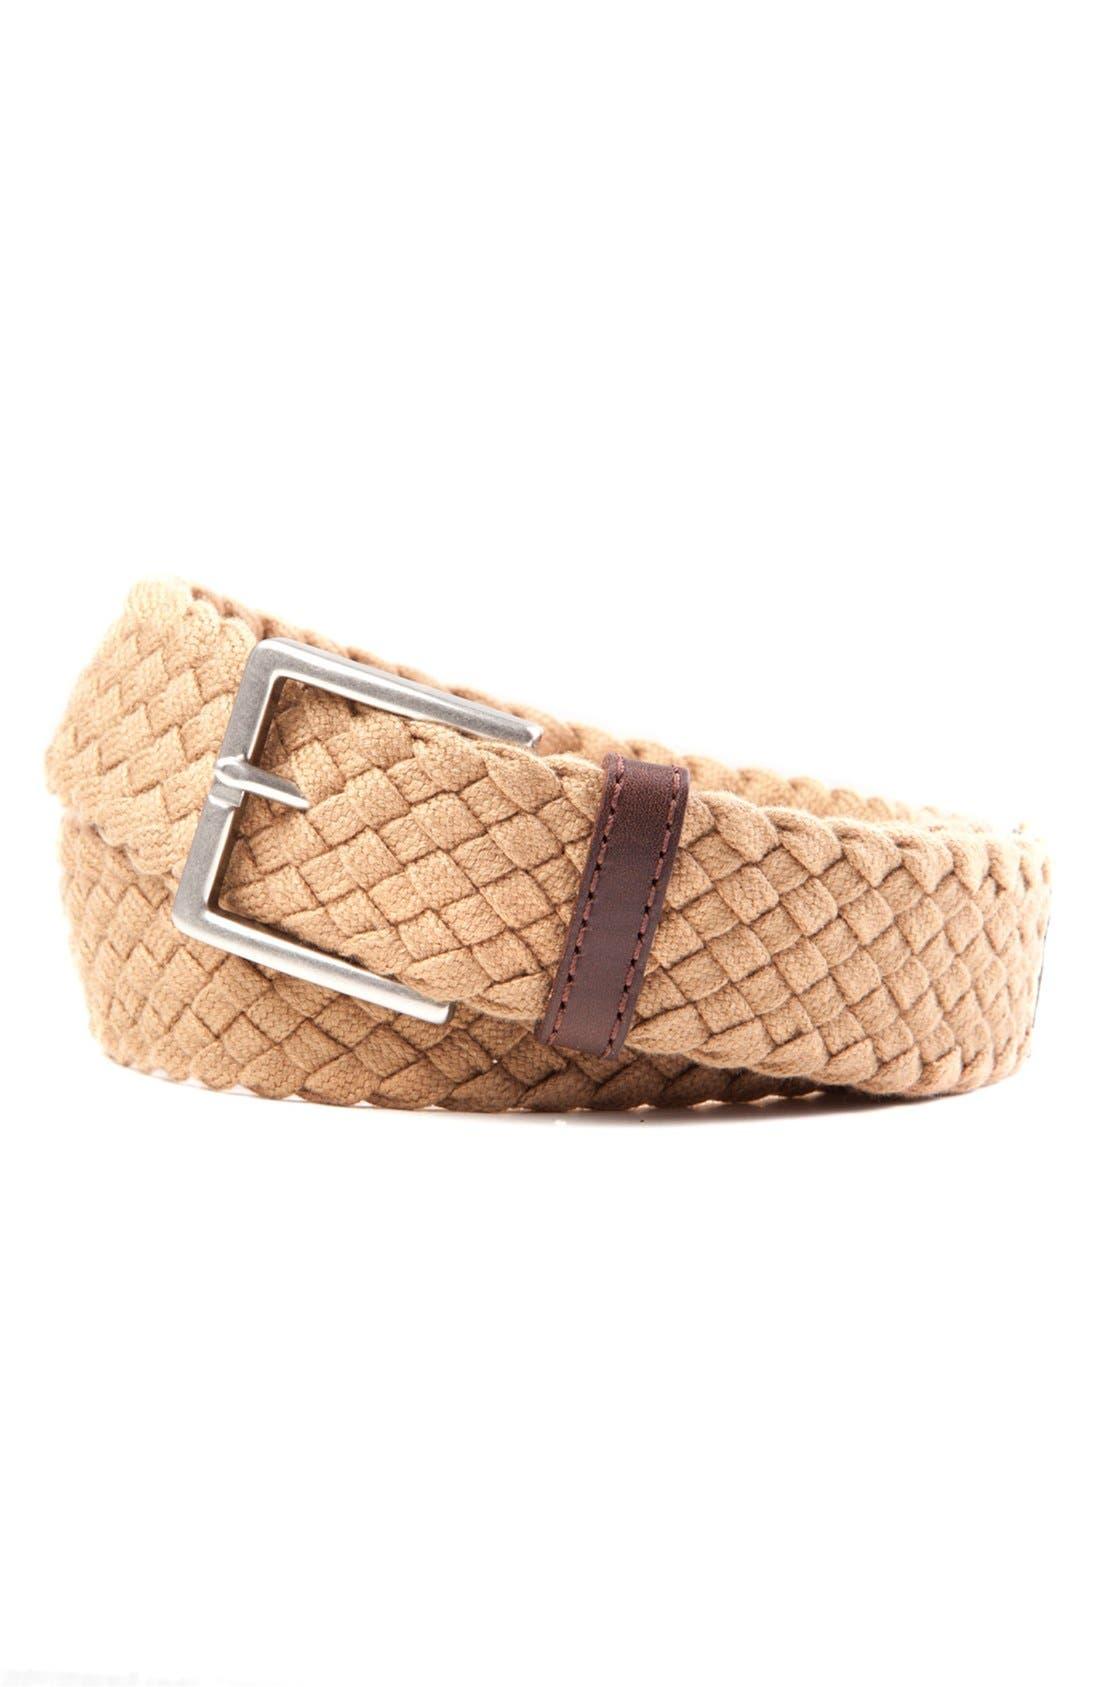 TOMMY BAHAMA Braided Cotton Belt, Main, color, KHAKI